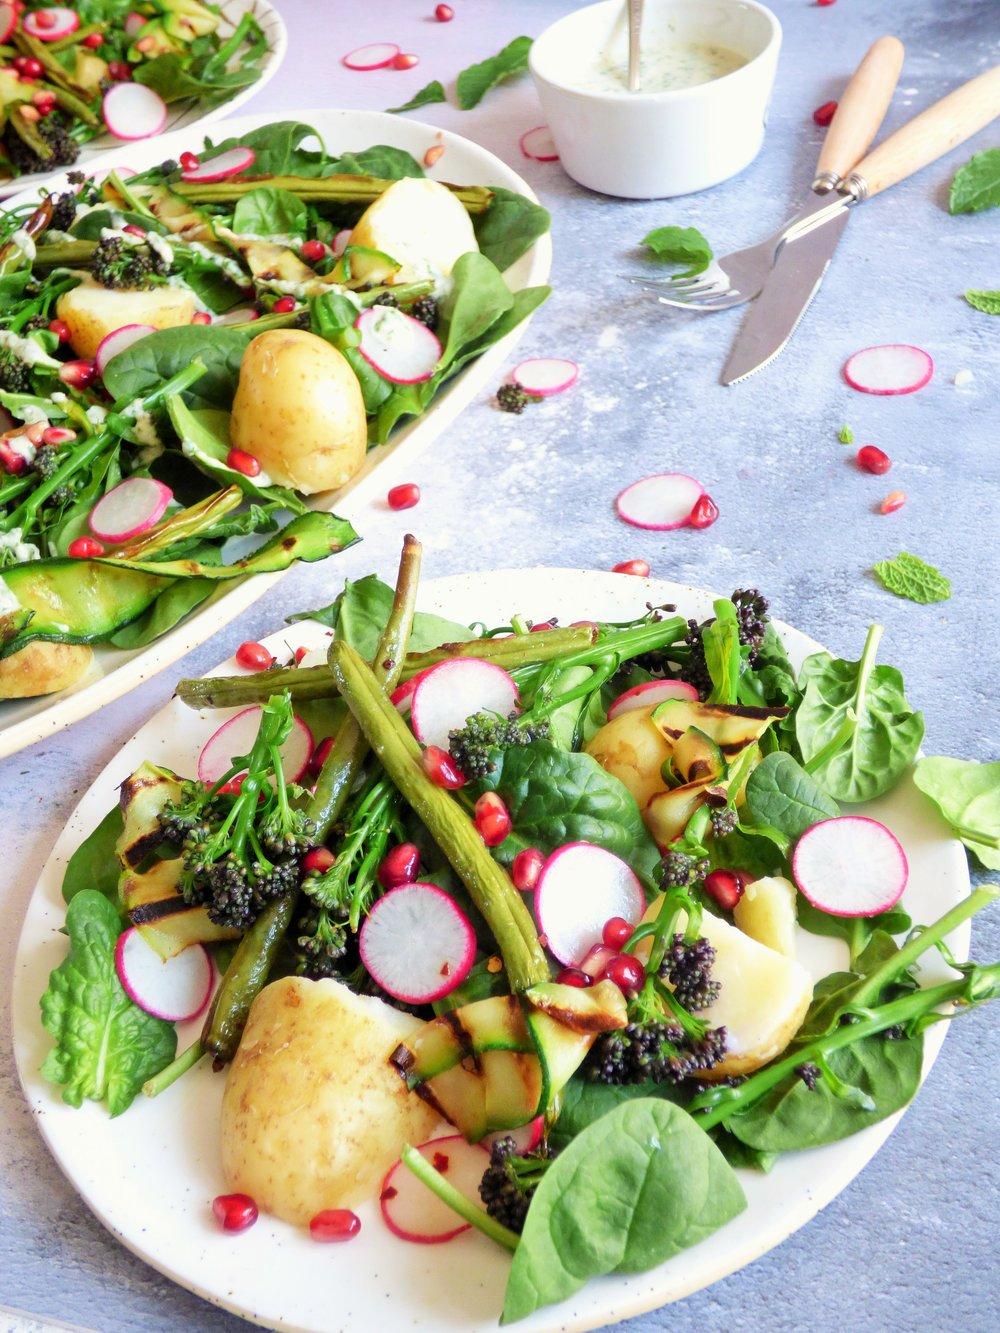 minty salad7.JPG